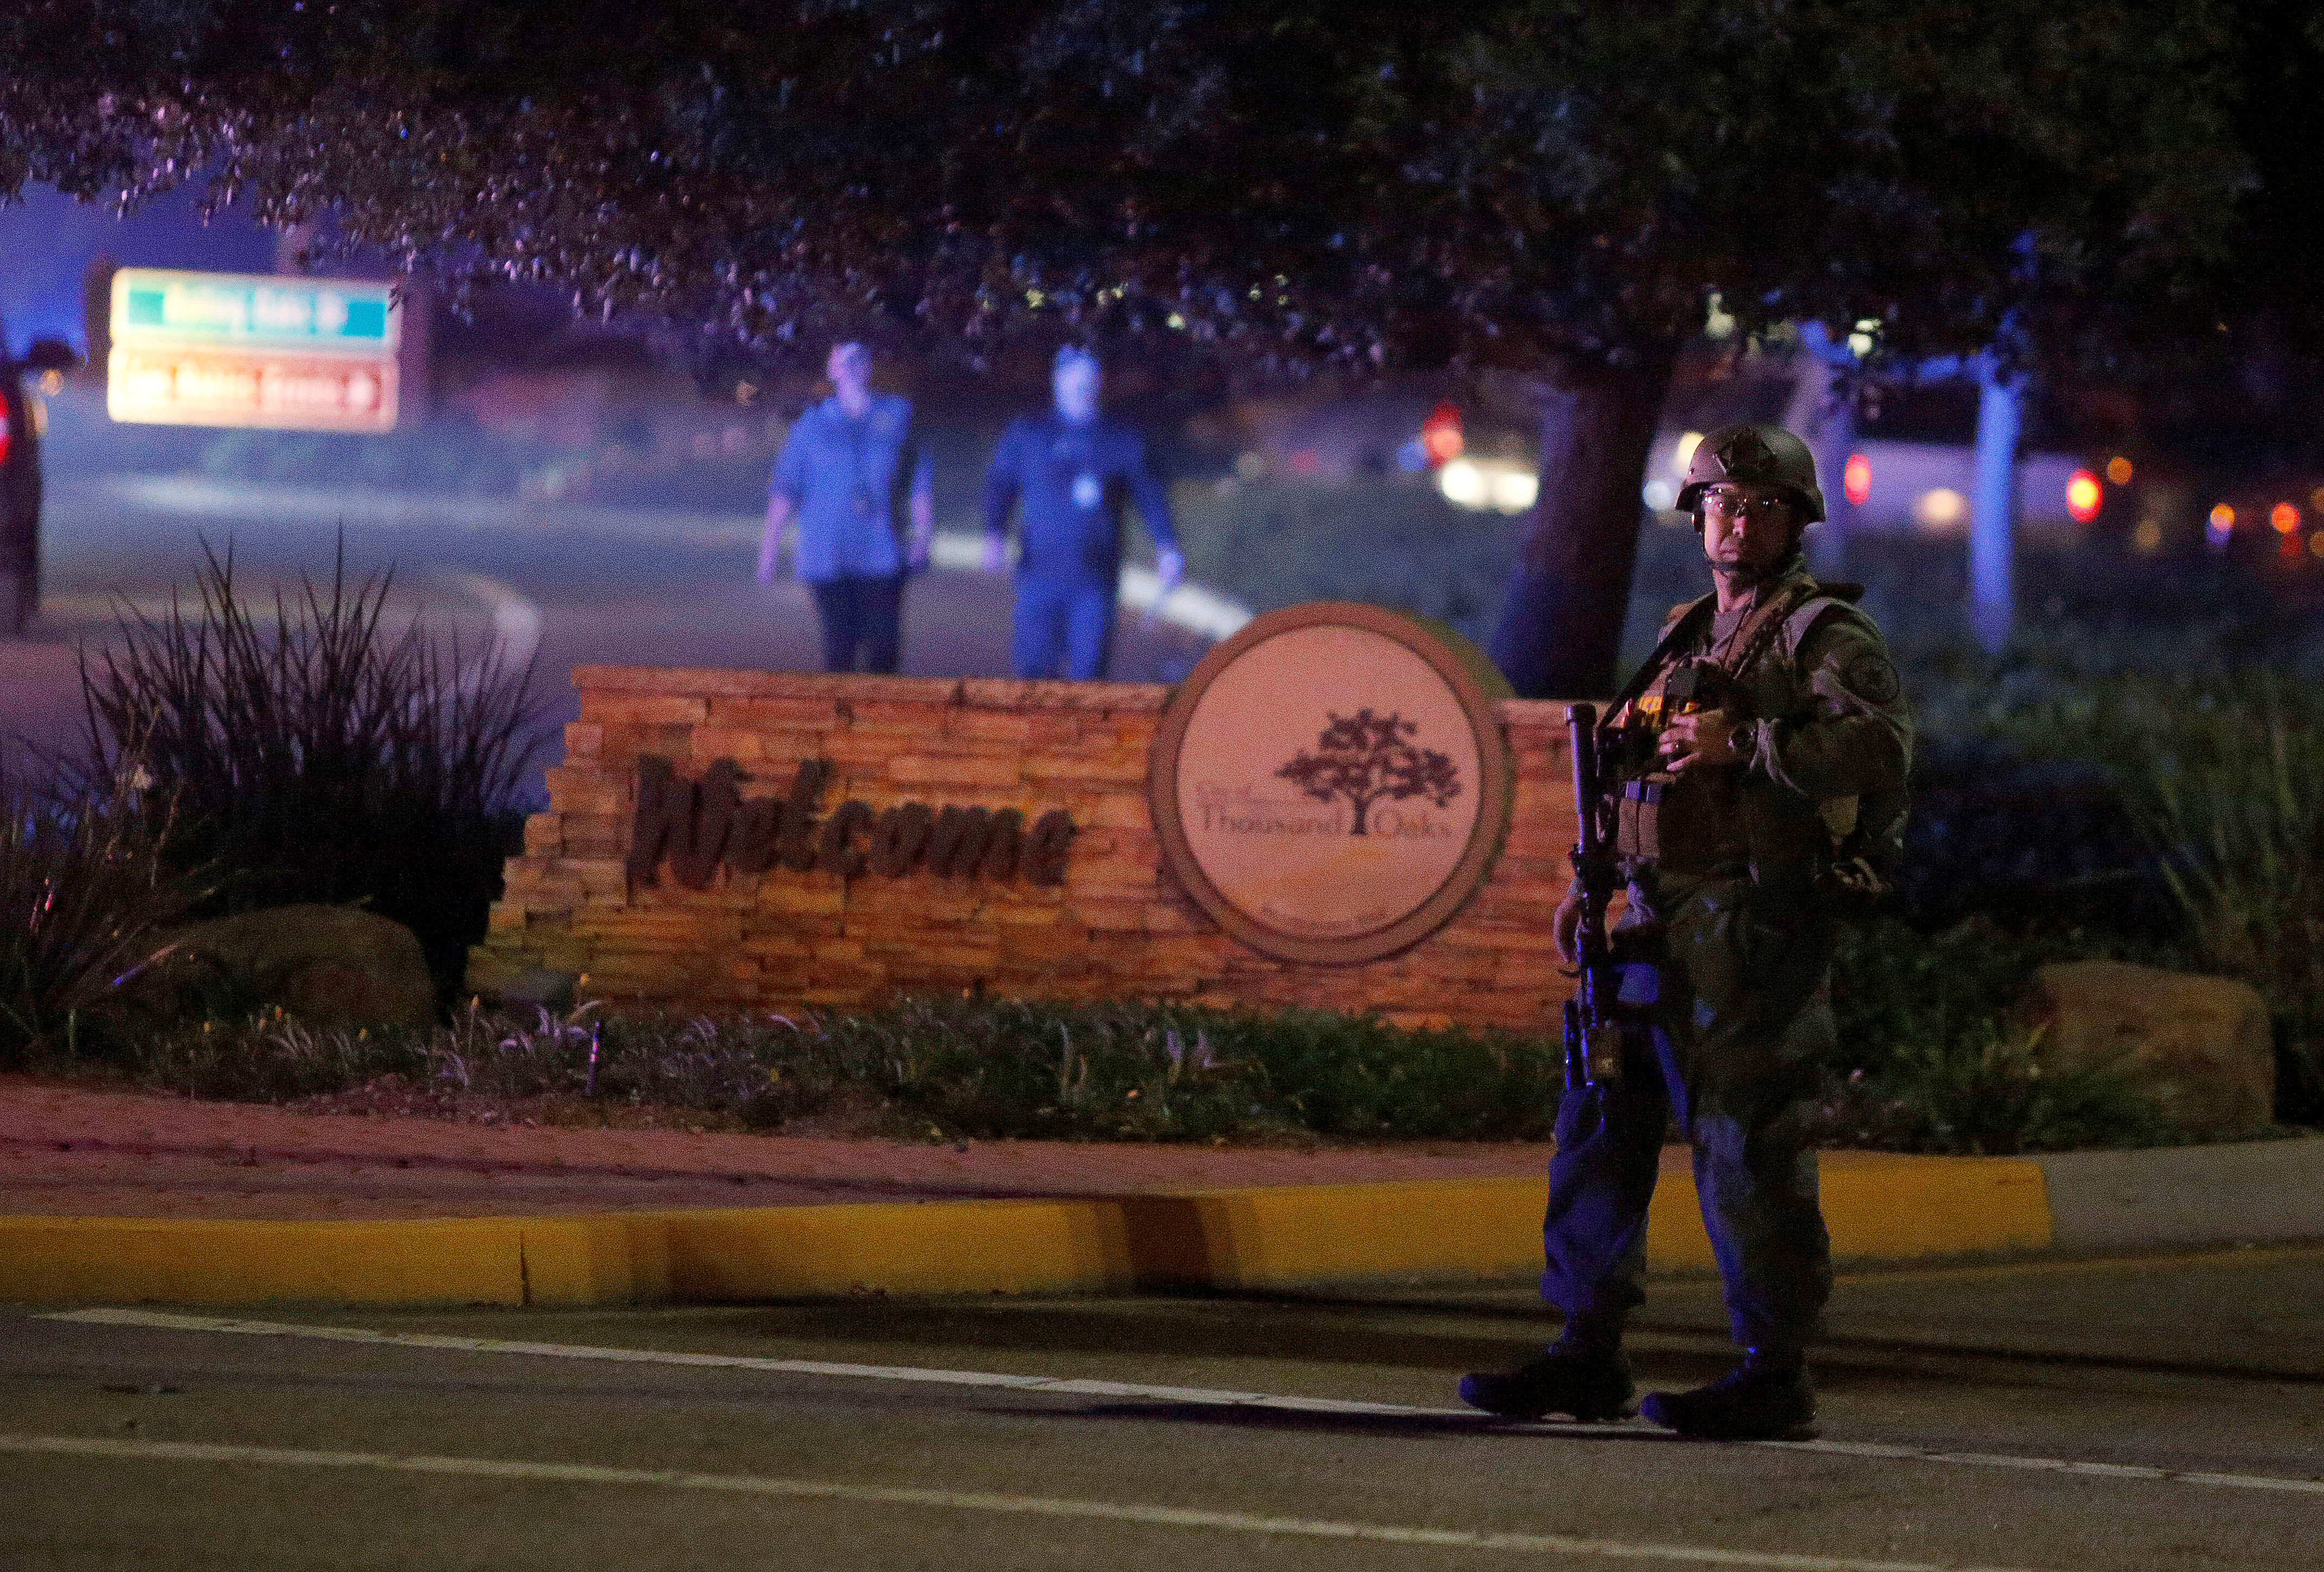 Police guard the site of a mass shooting at a bar in Thousand Oaks, California, U.S. November 8, 2018. REUTERS/Ringo Chiu